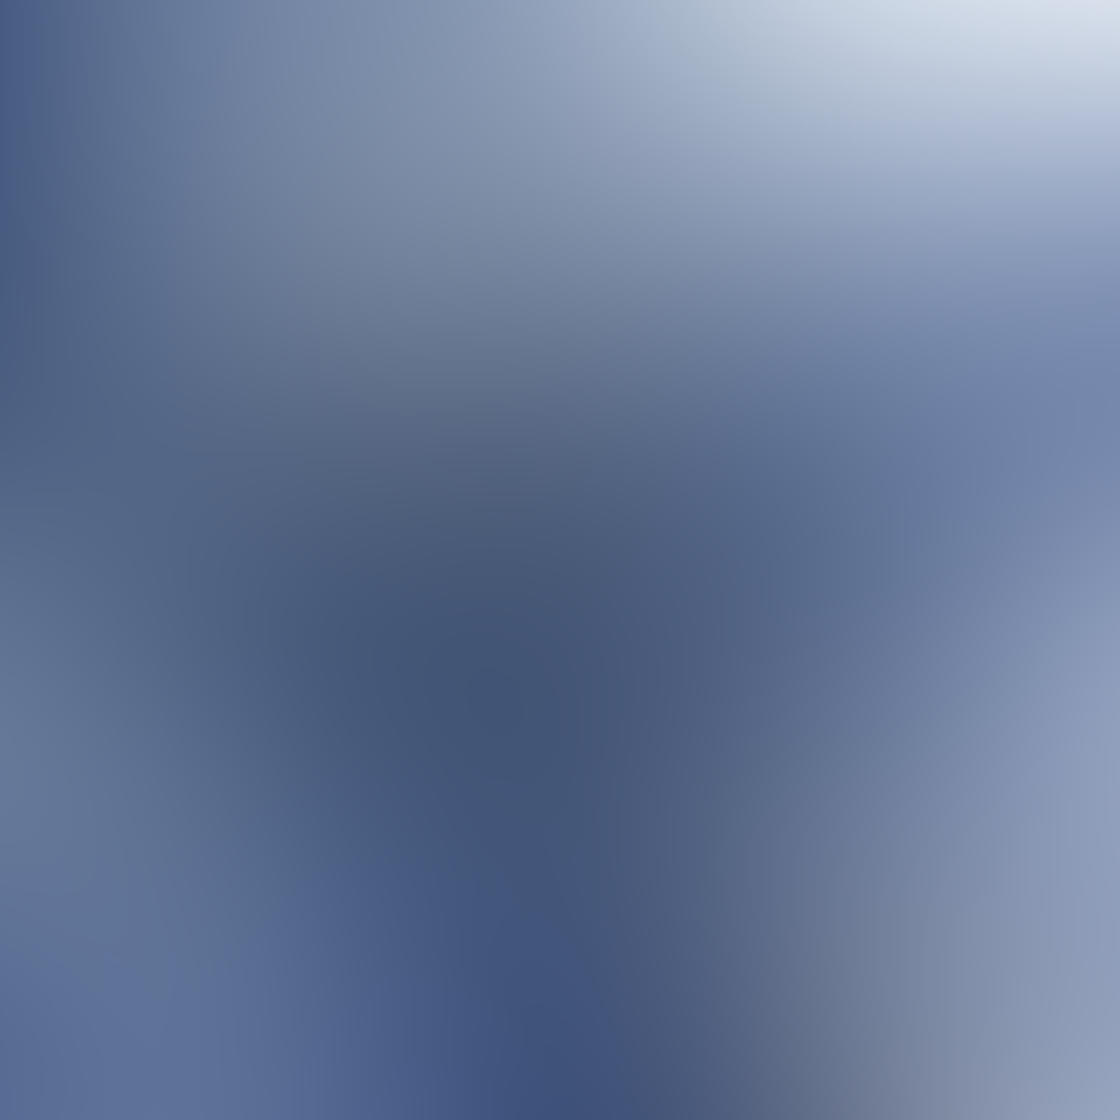 iPhone Photos Blue Color 26